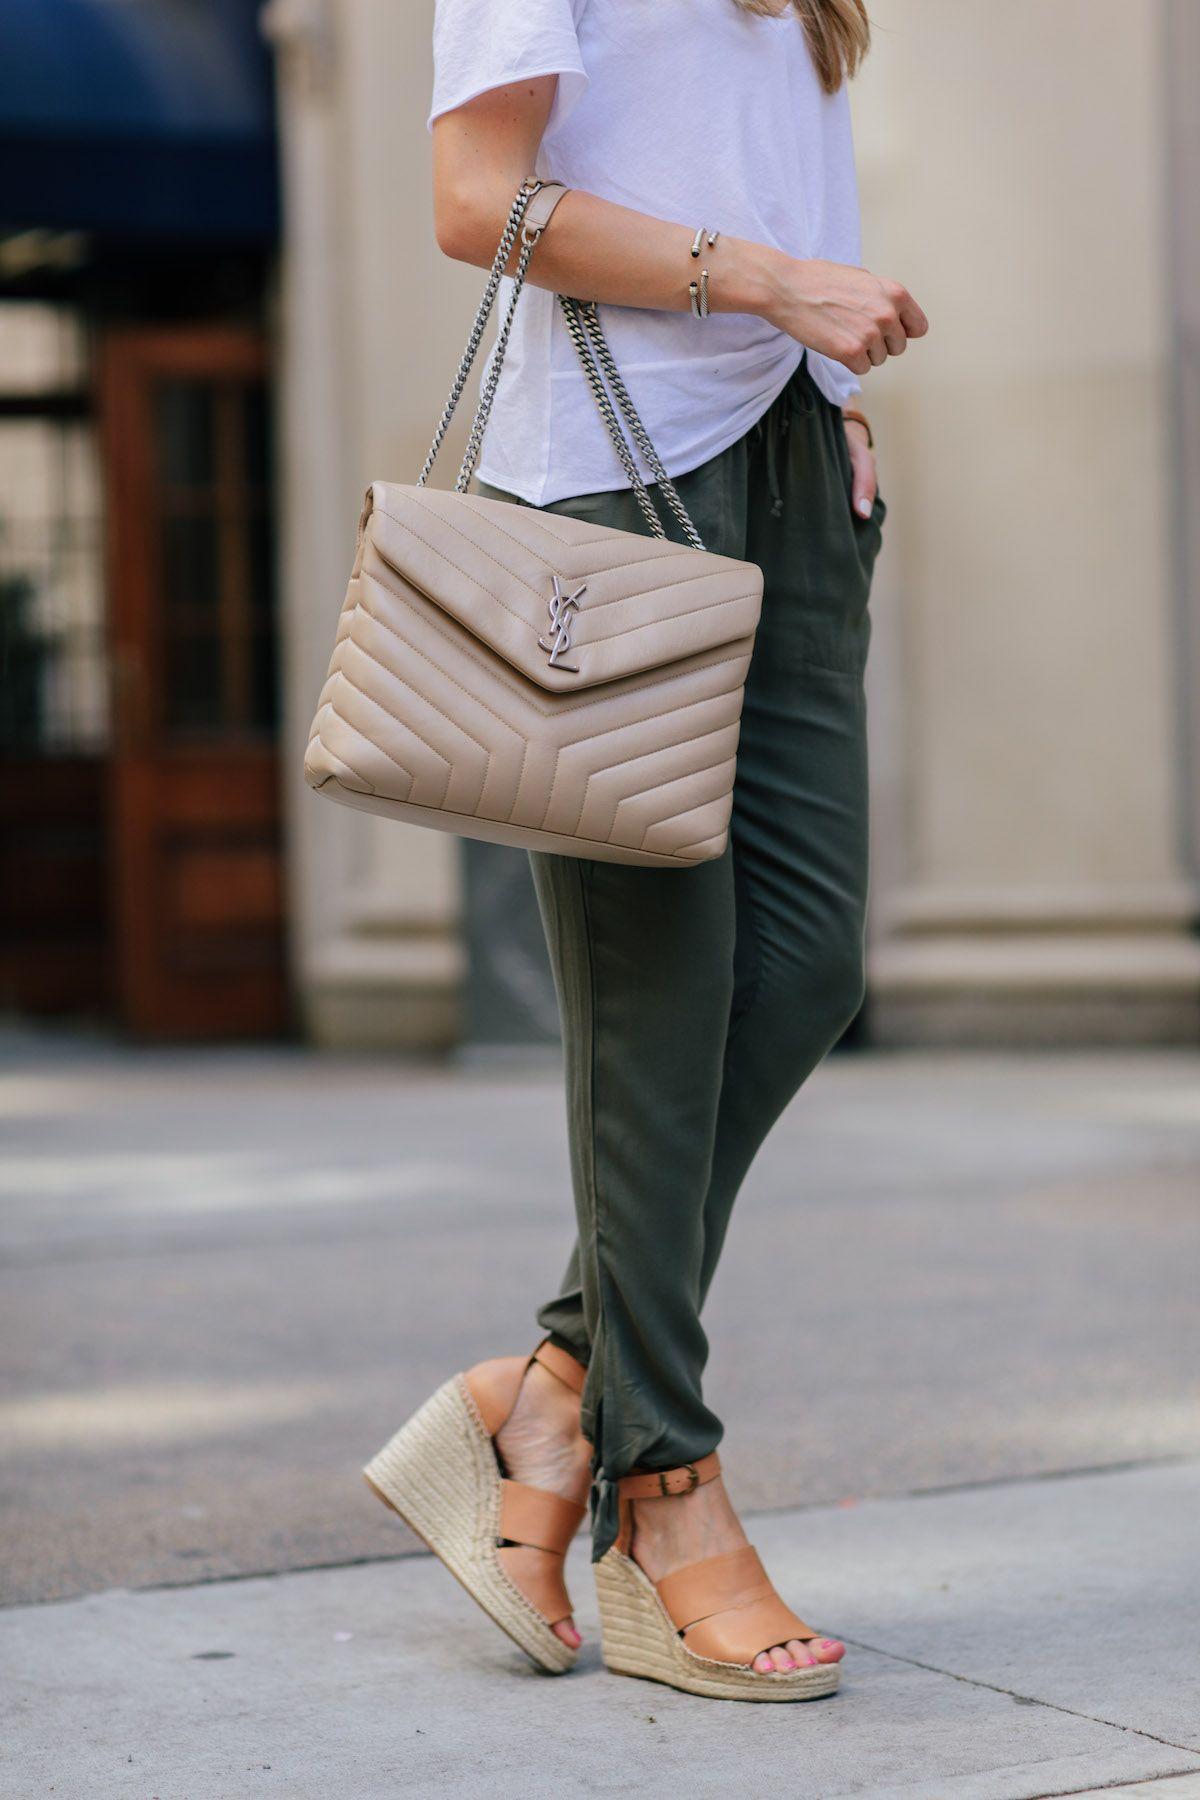 57d312c75ab Saint Laurent LouLou Medium Chain Bag | Accessories in 2019 | Bags ...